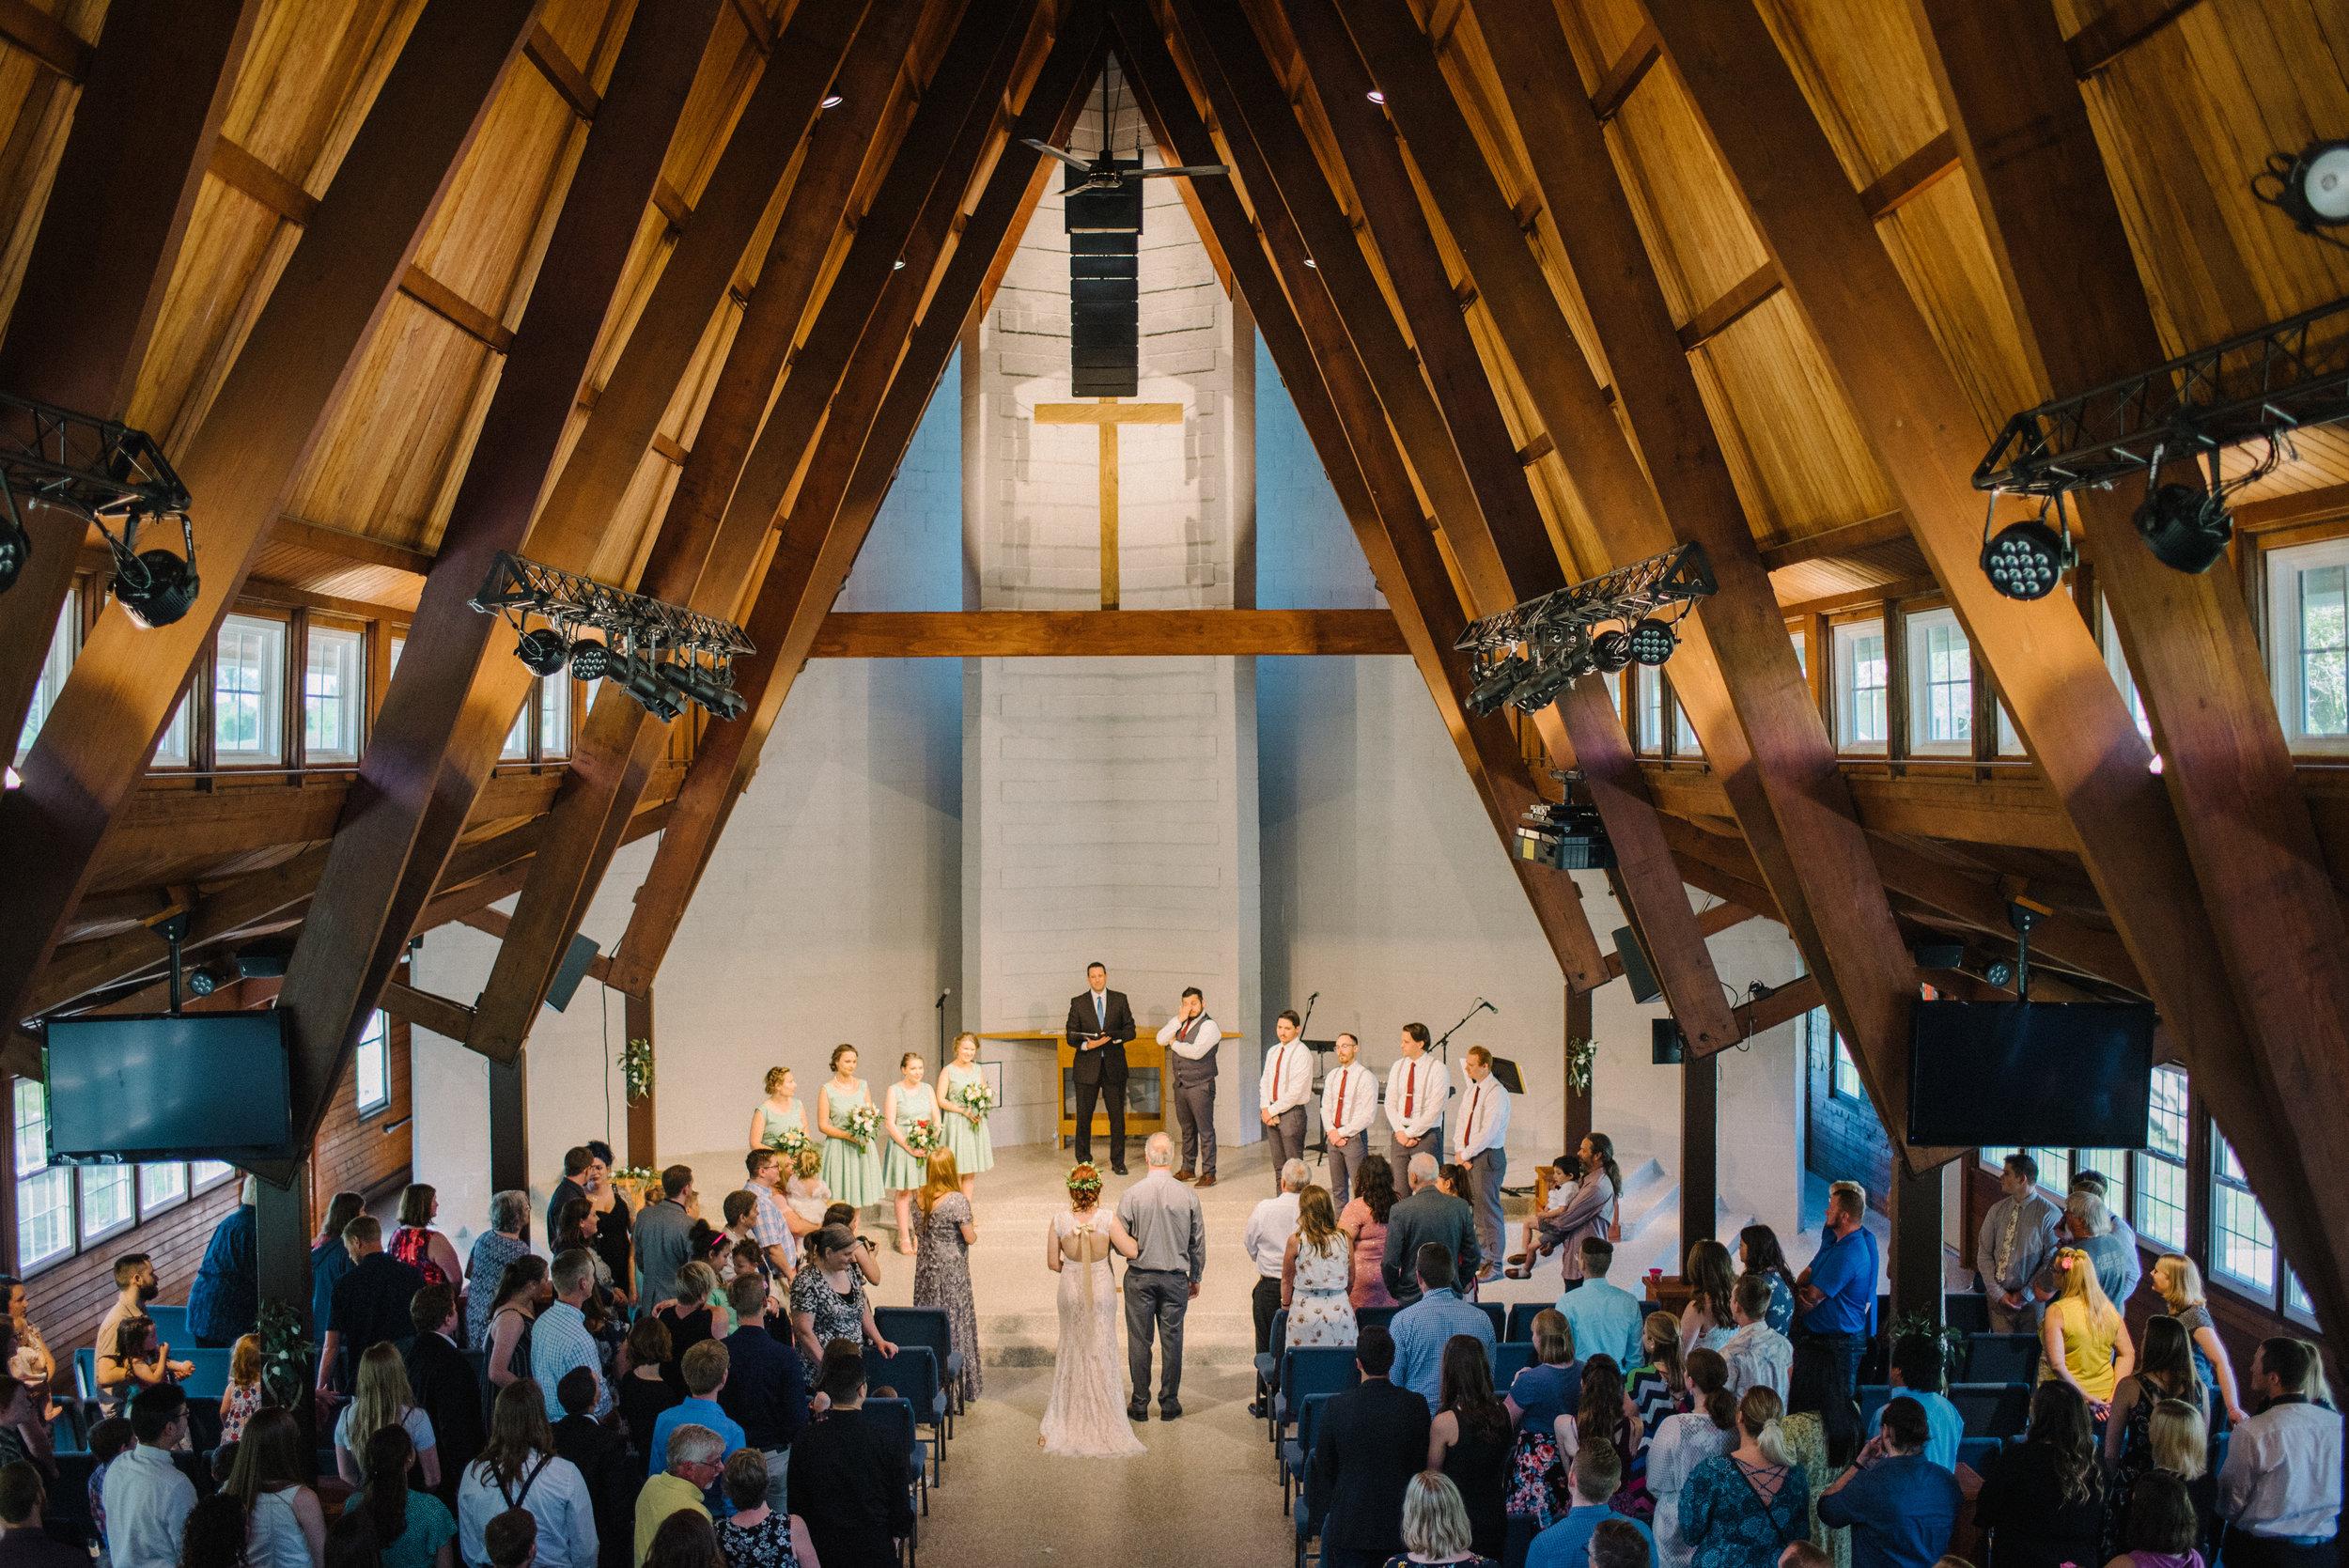 riverside bible camp wedding chapel